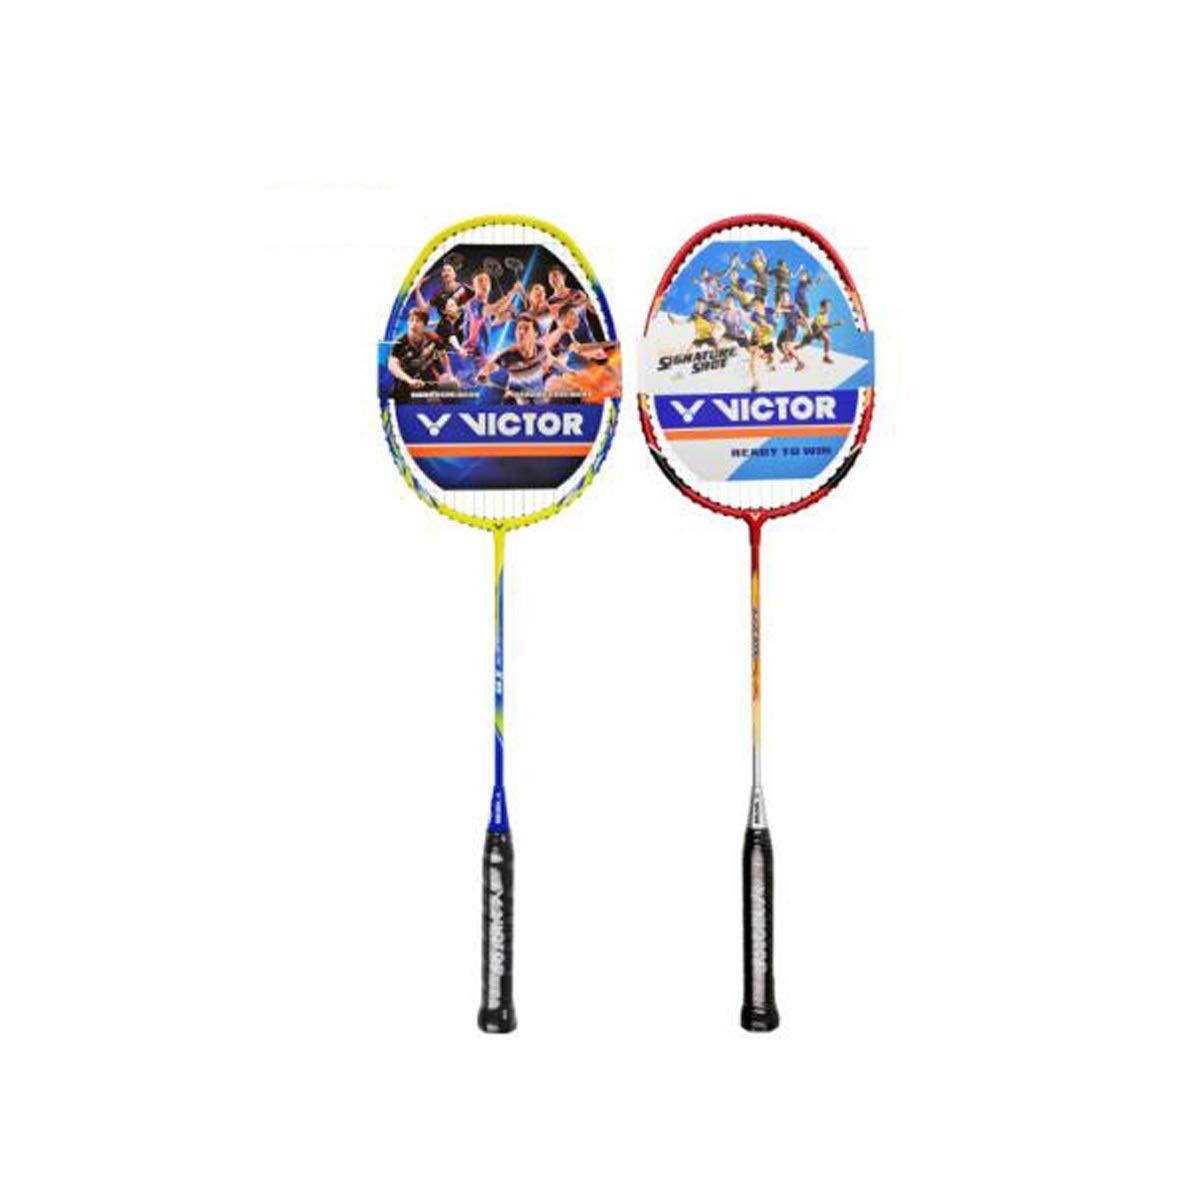 Tongboshi Badminton Racket, Double Shot, Offensive Full Carbon Badminton Racket, Aluminum Alloy Badminton Racket Badminton Racket, (Edition : C)